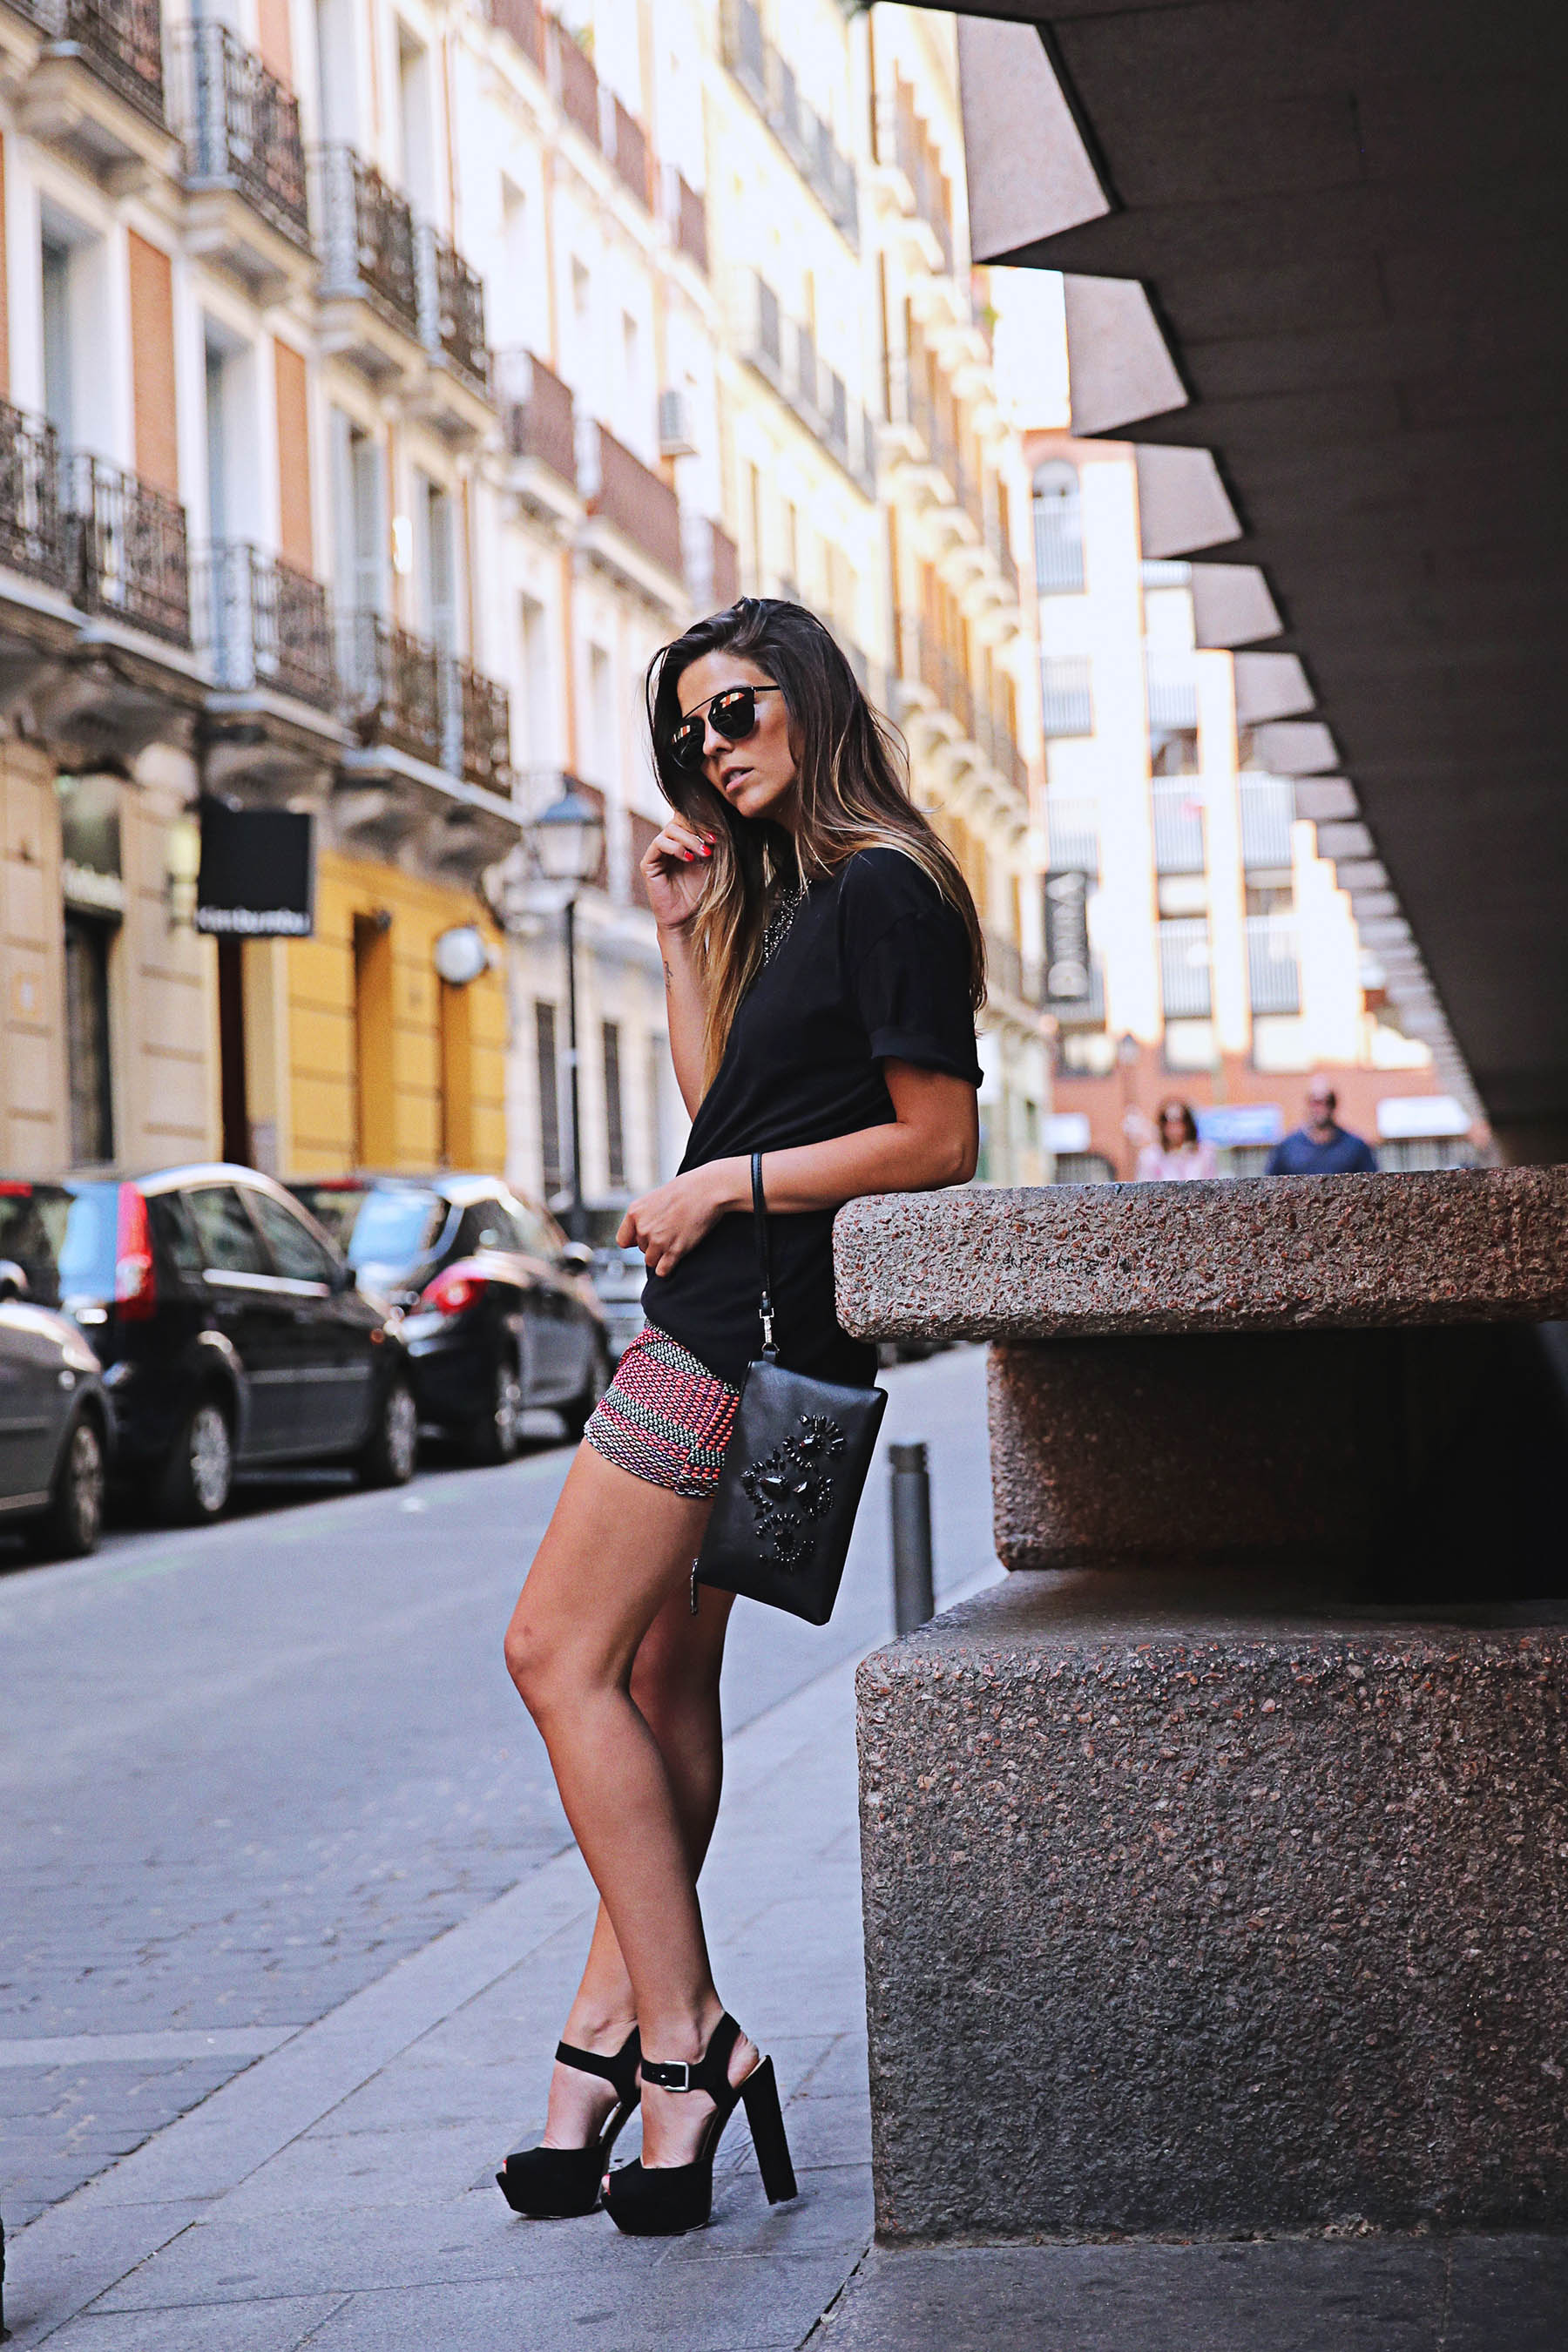 trendy-taste-look-outfit-street-style-ootd-blog-blogger-fashion-spain-moda-españa-falda-etnica-ethnic-print-skirt-steve-madden-basic-tee-dior-black-negro-5